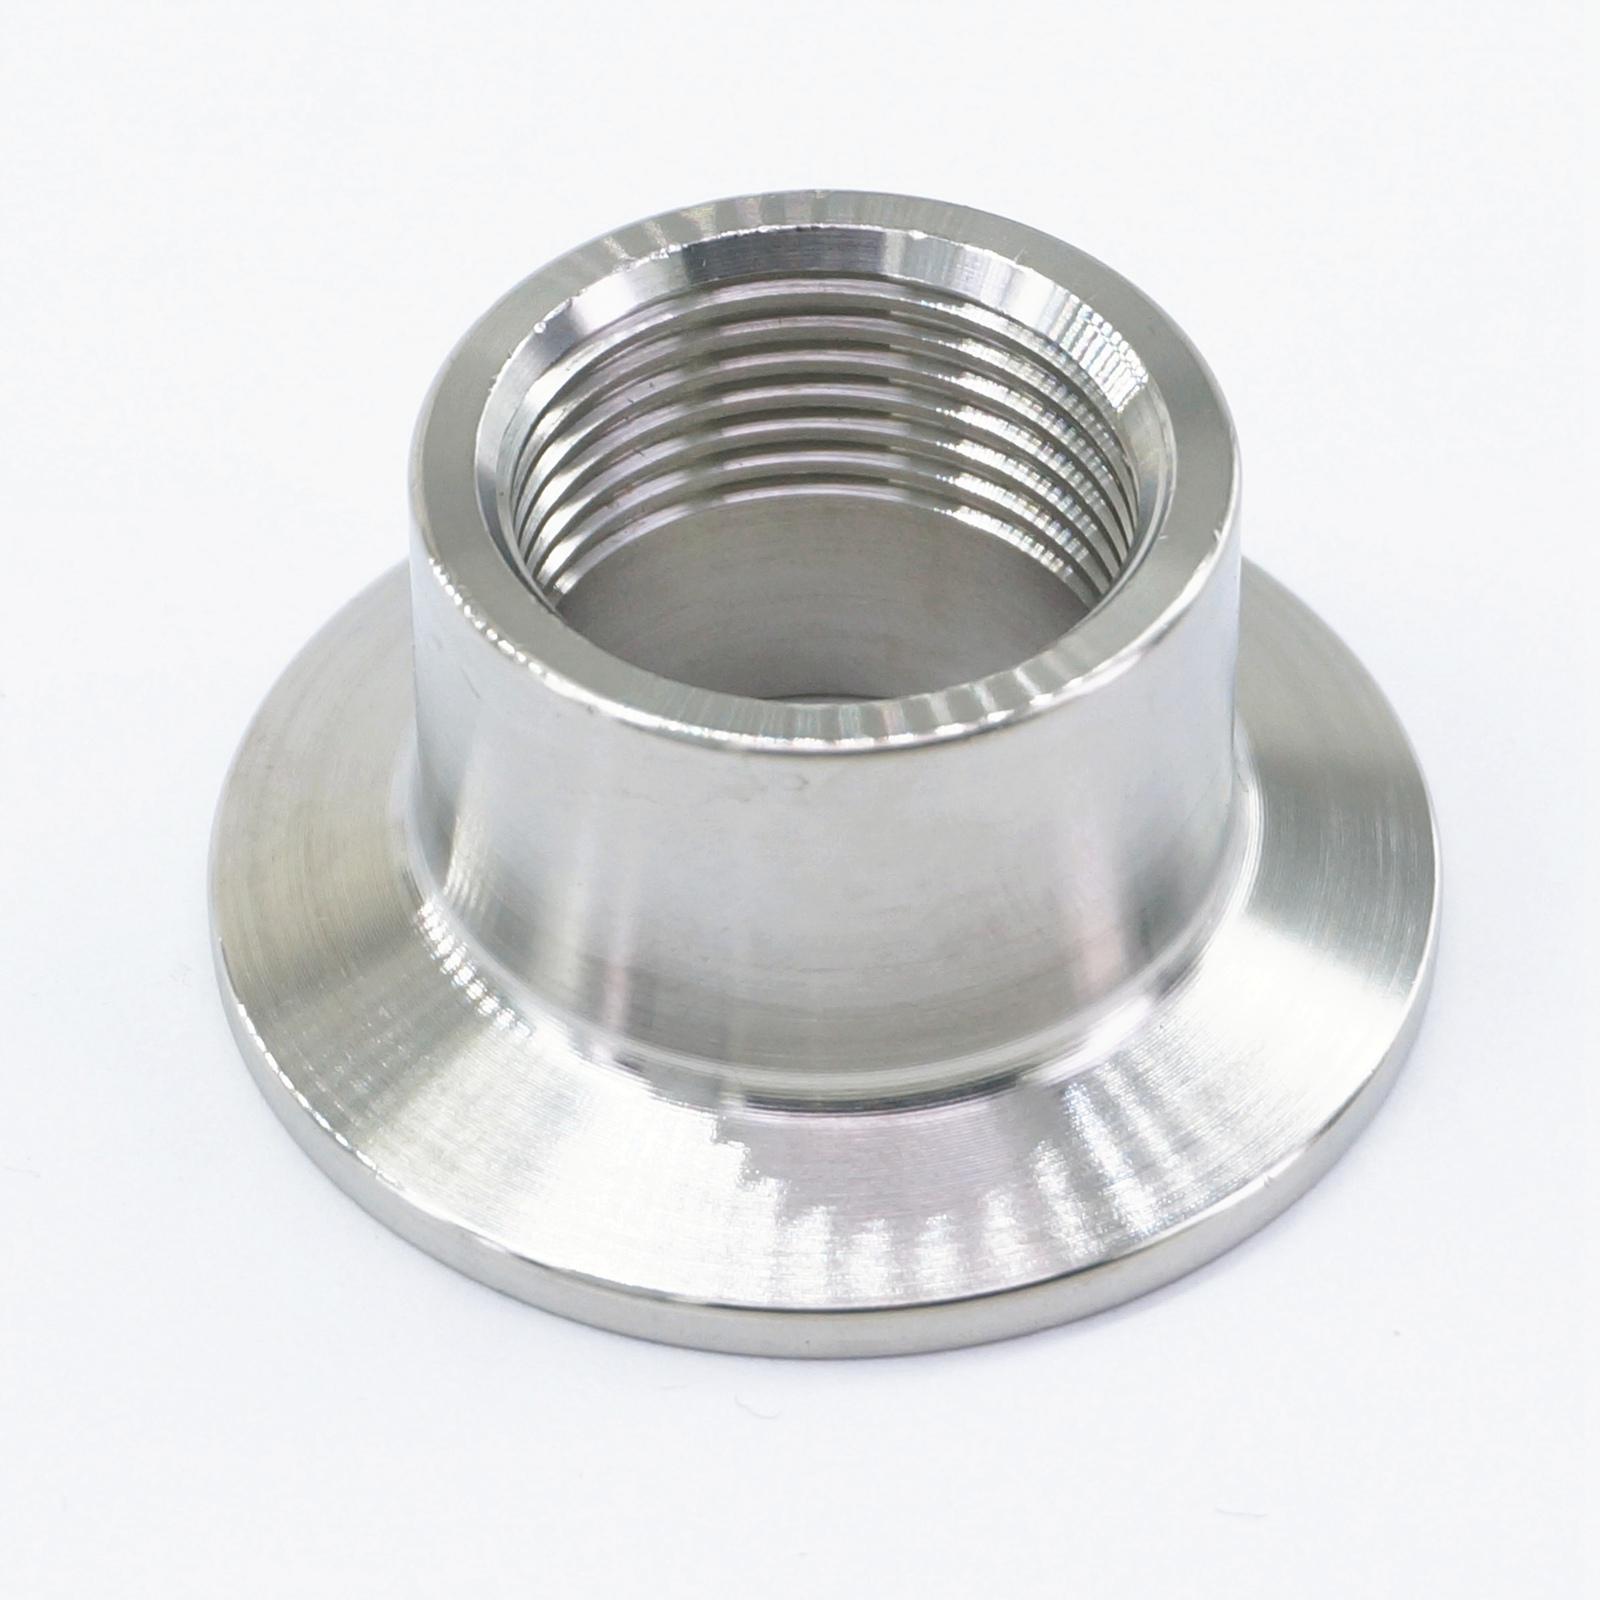 "3/4 ""BSPT hembra x 1,5"" Tri Clamp 50,5mm virola O/D 304 Acero inoxidable conector de instalación de tuberías sanitarias para Homebrew"